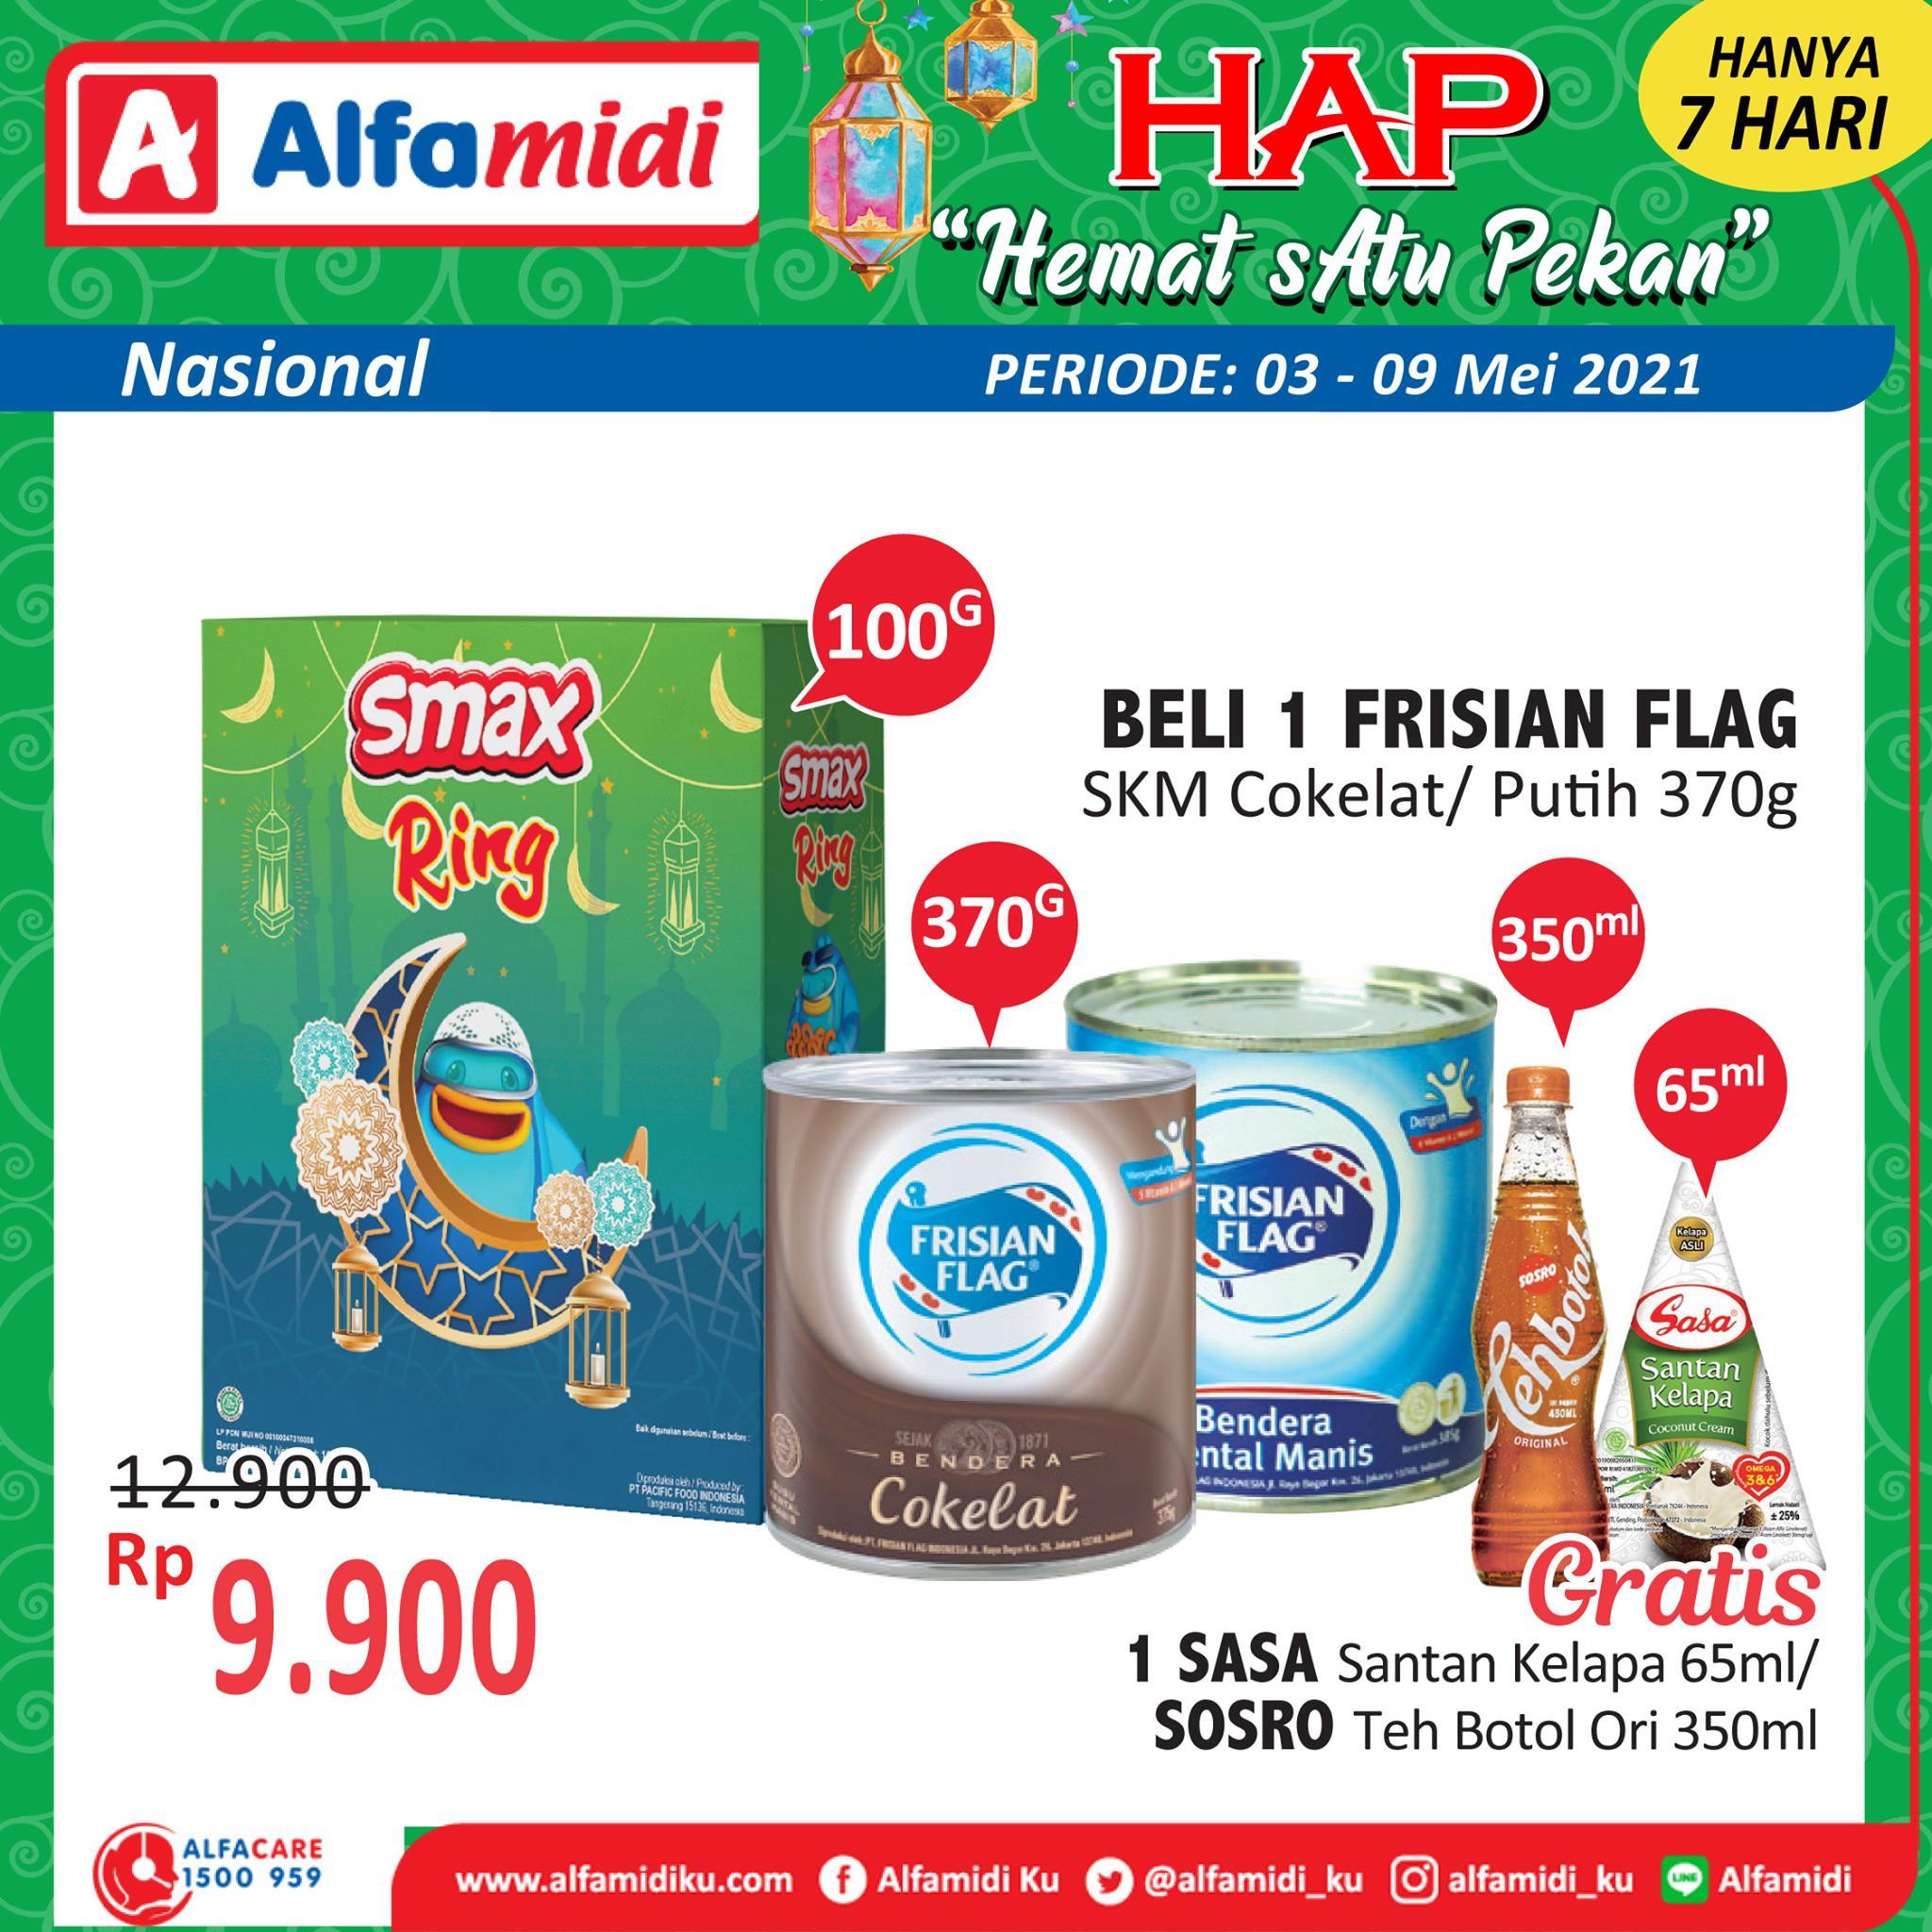 Promo ALFAMIDI HEMAT SATU PEKAN periode 03-09 Mei 2021